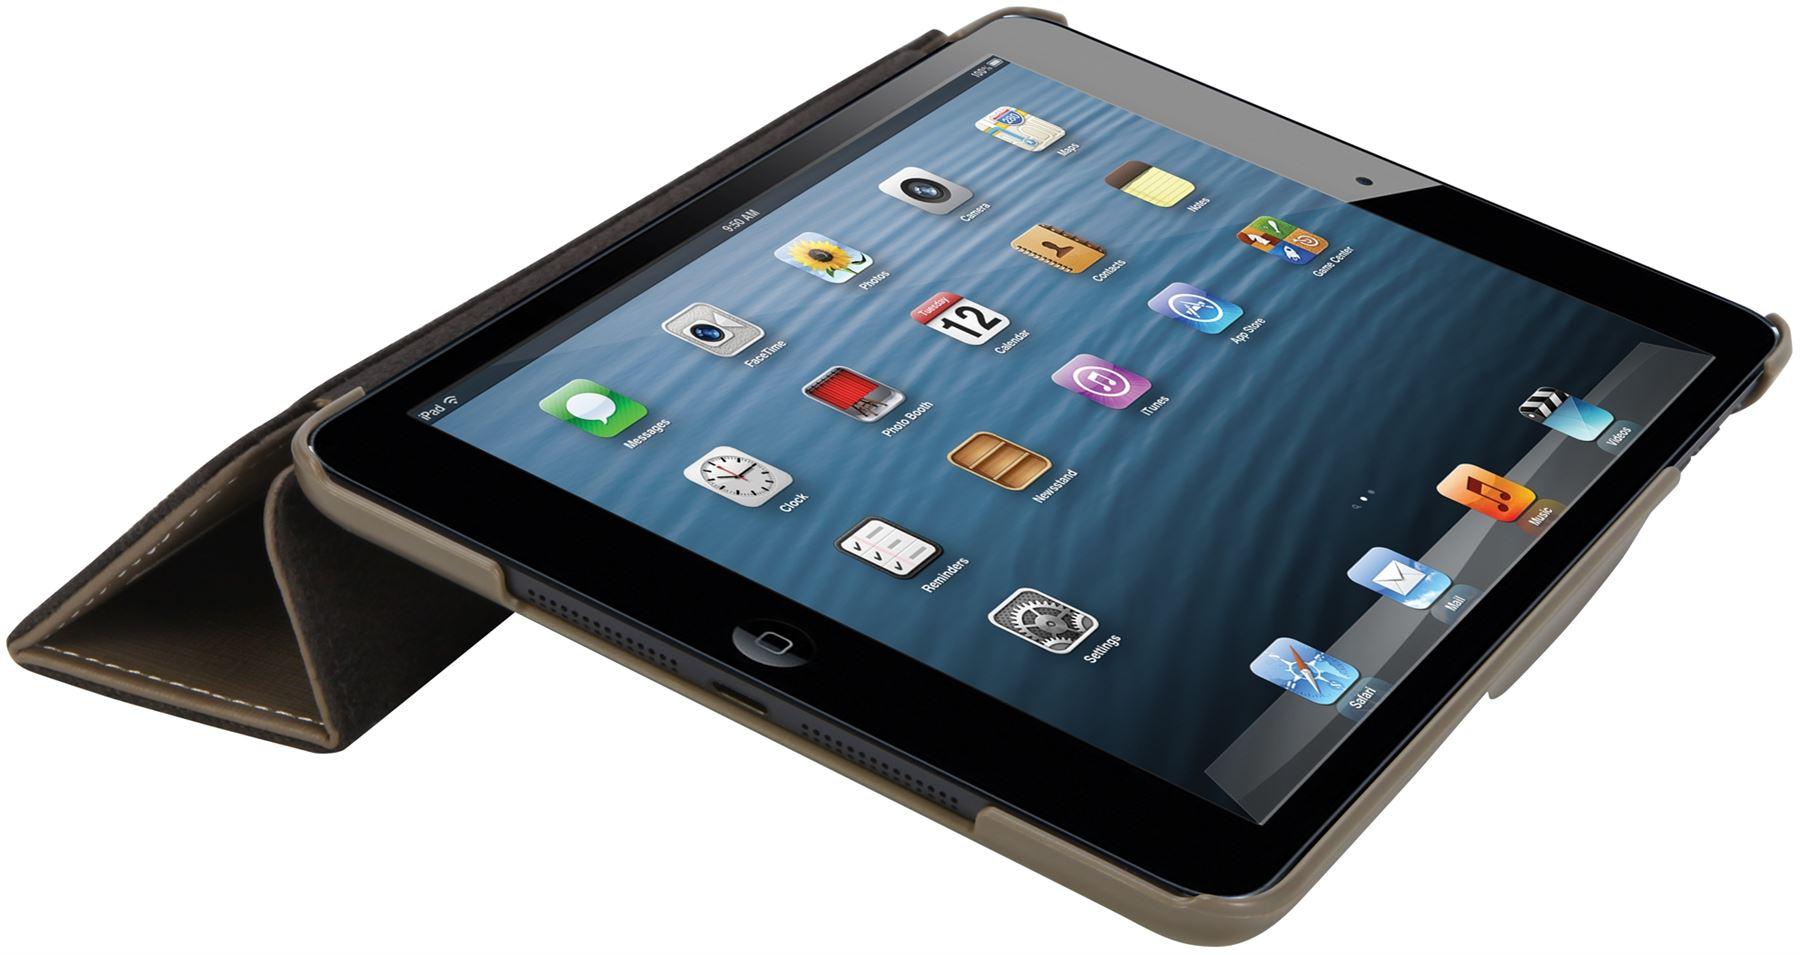 Targus Designer Series Triad For IPad Mini THZ235P01US Gray Tablet Case